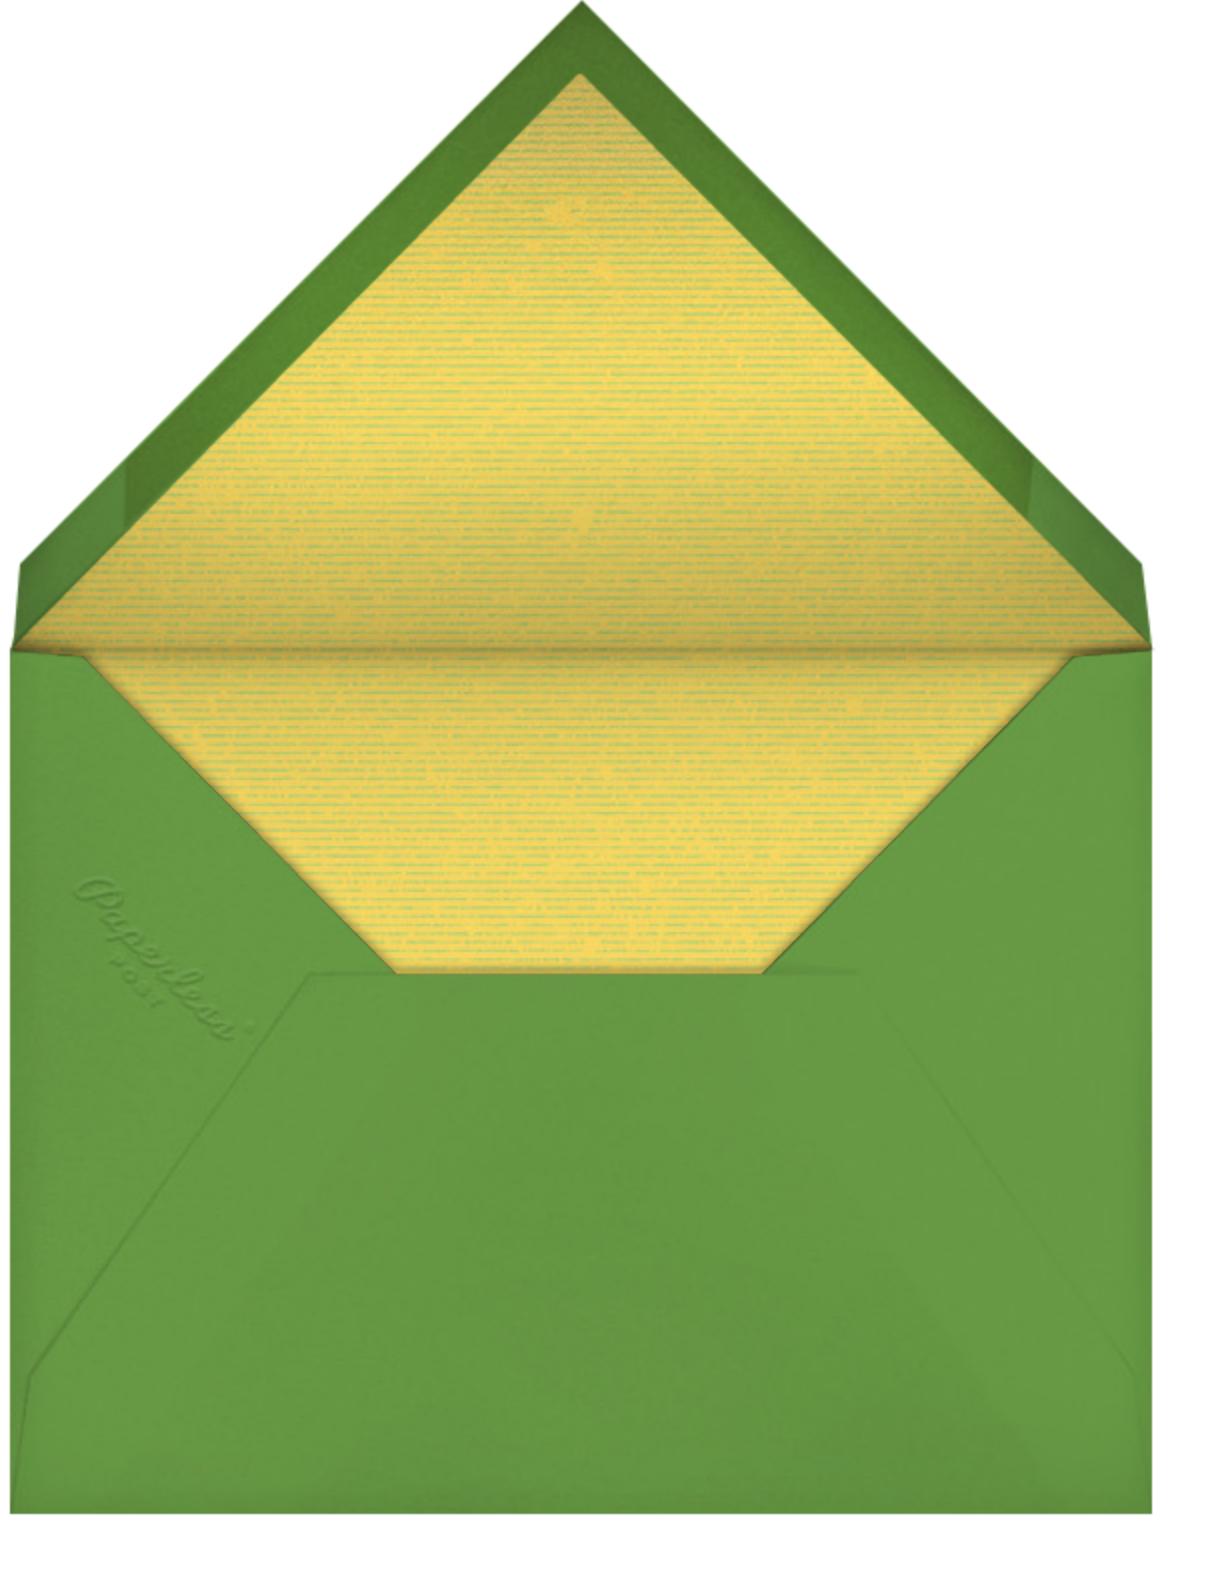 Tee Time - Paperless Post - Kids' birthday - envelope back